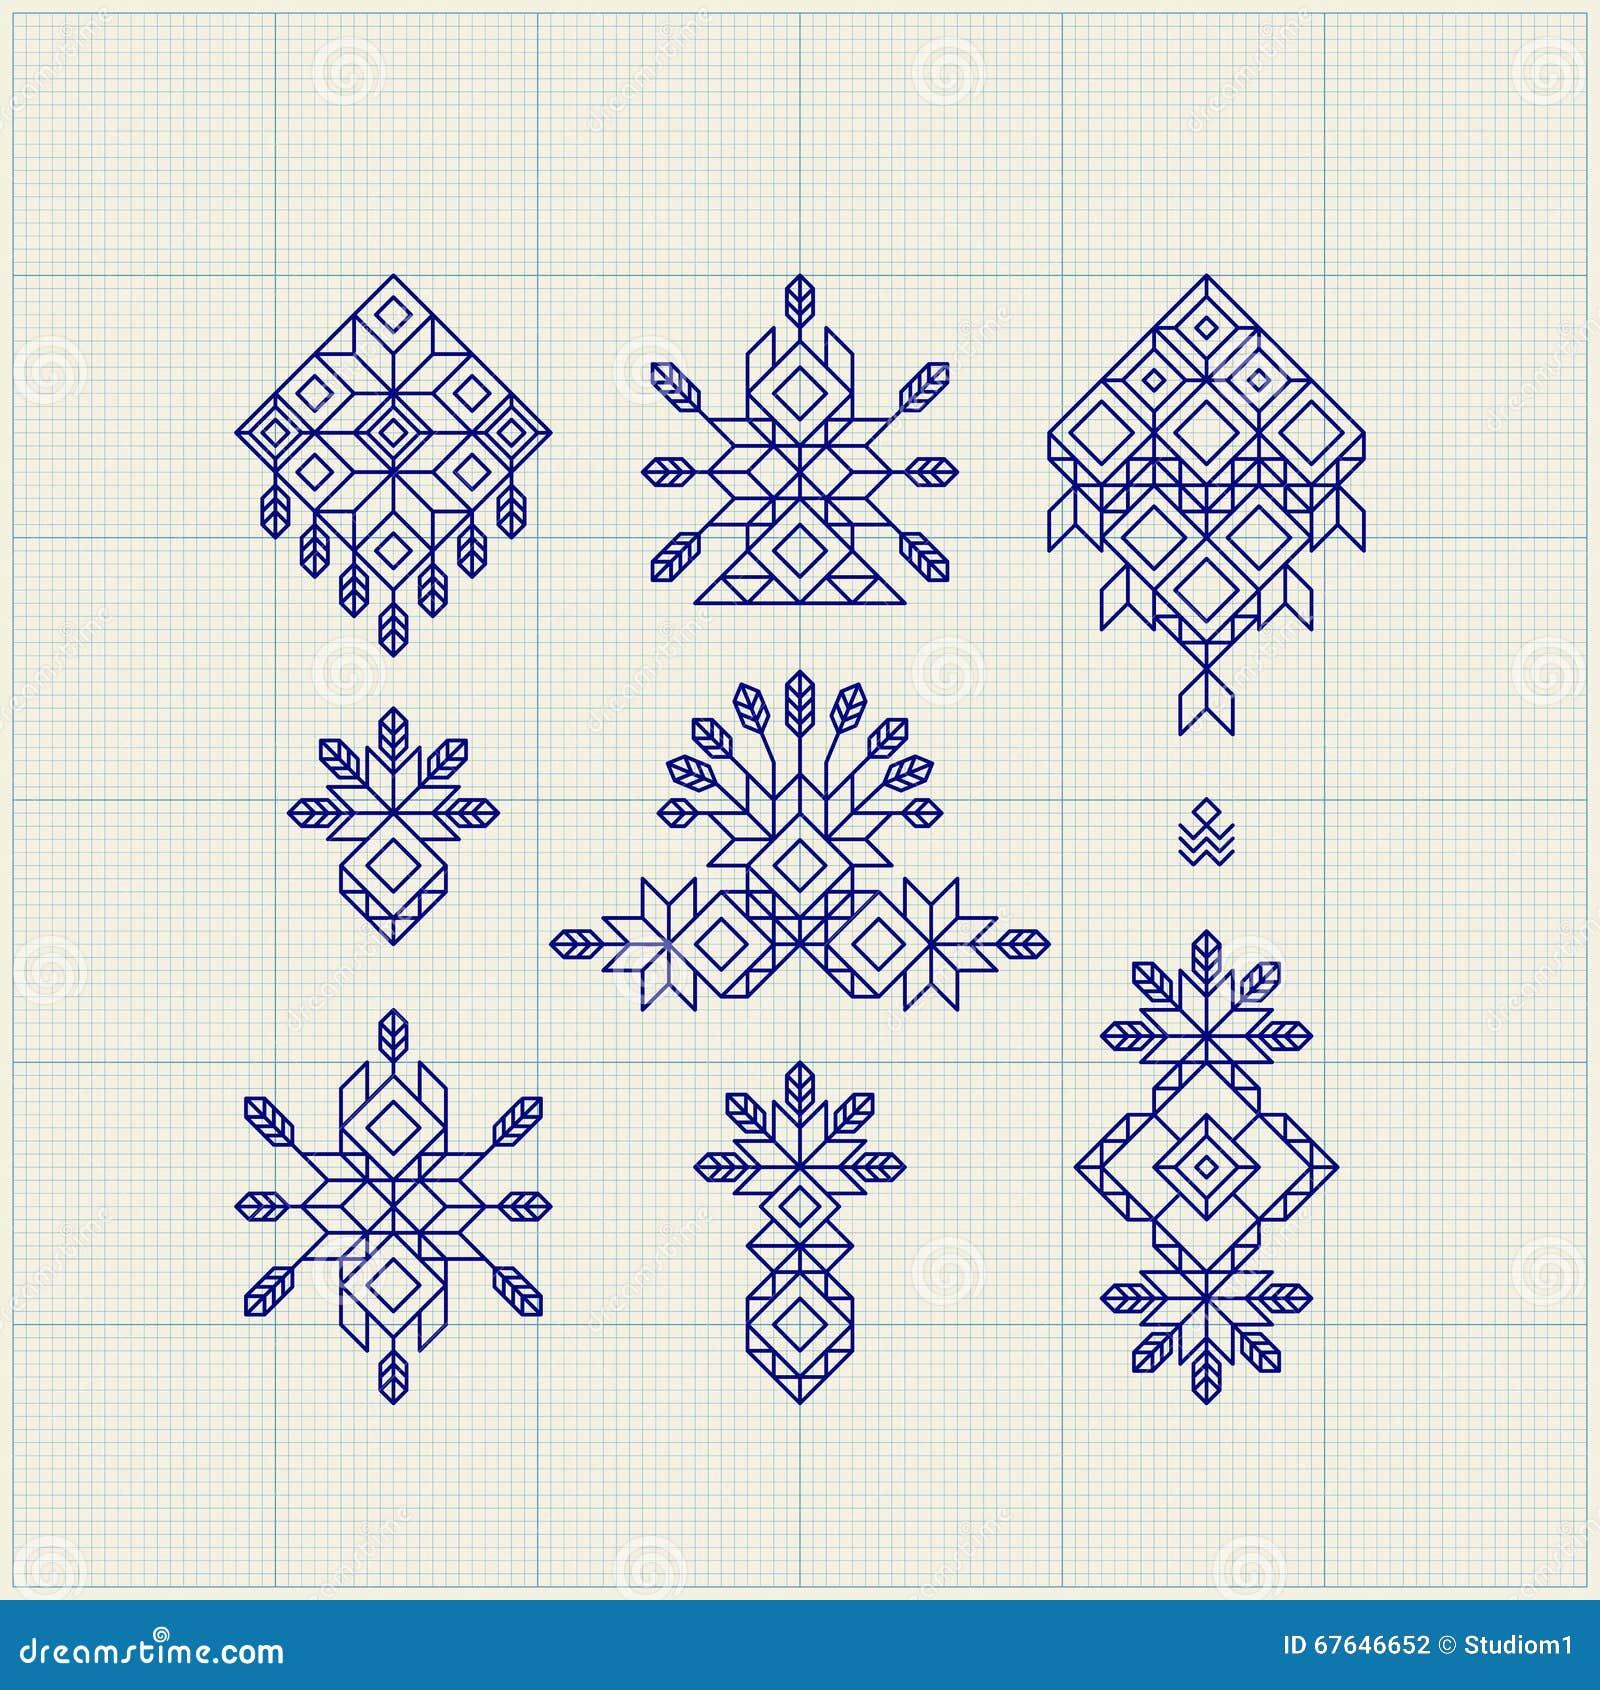 Graphic Line Design Art : Set of vintage graphic elements for design line art